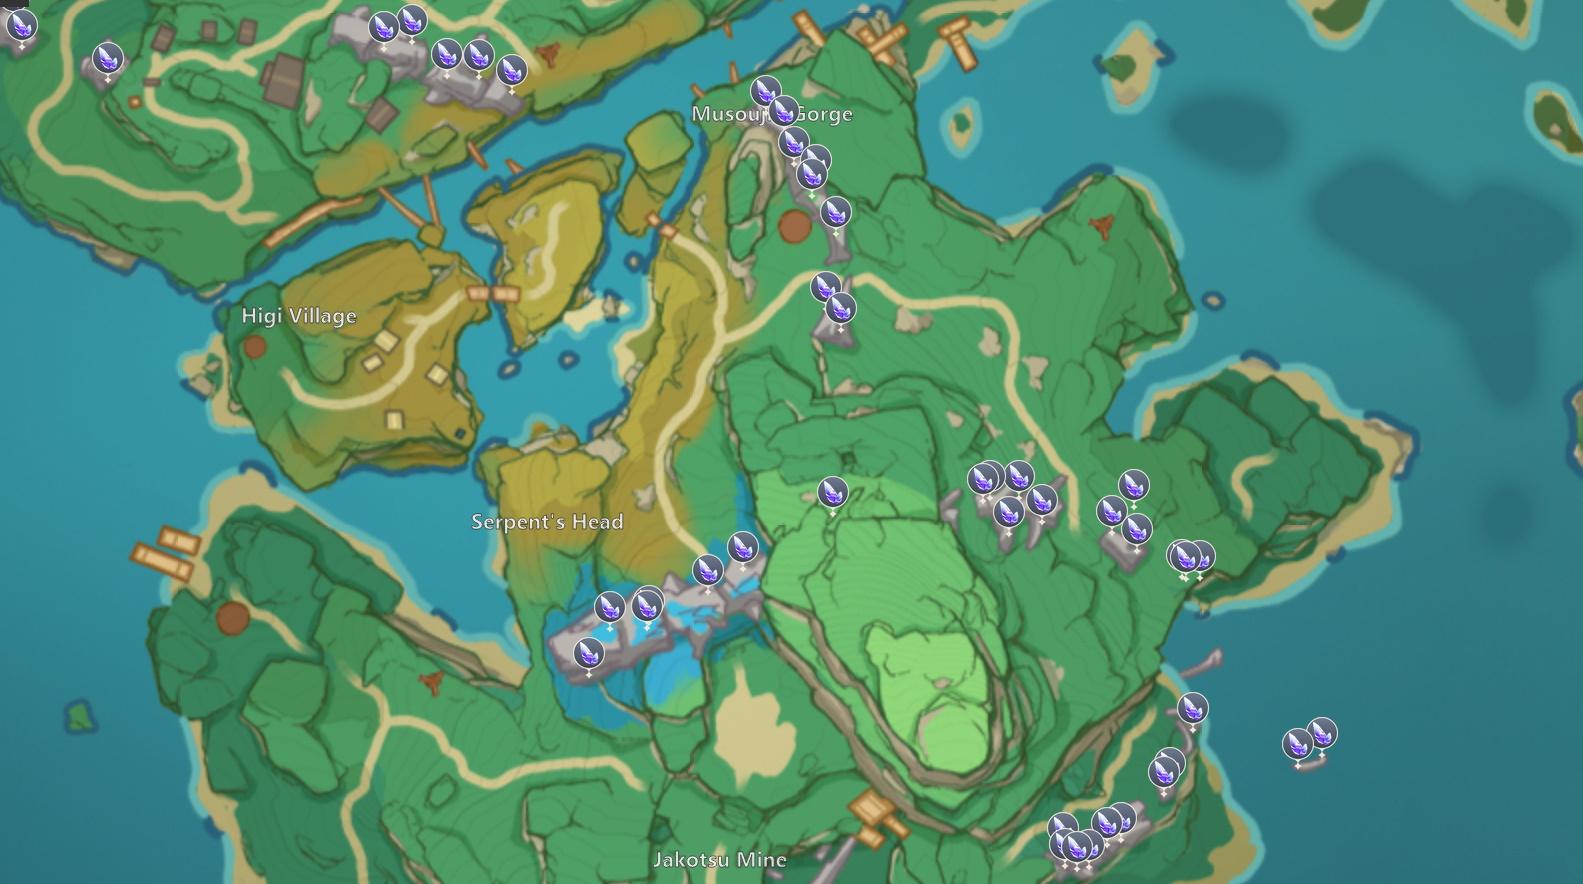 Looking for the genshin impact electroculus locations in inazuma? Genshin Impact Crystal Marrow Locations And How To Farm Crystal Marrow Vg247